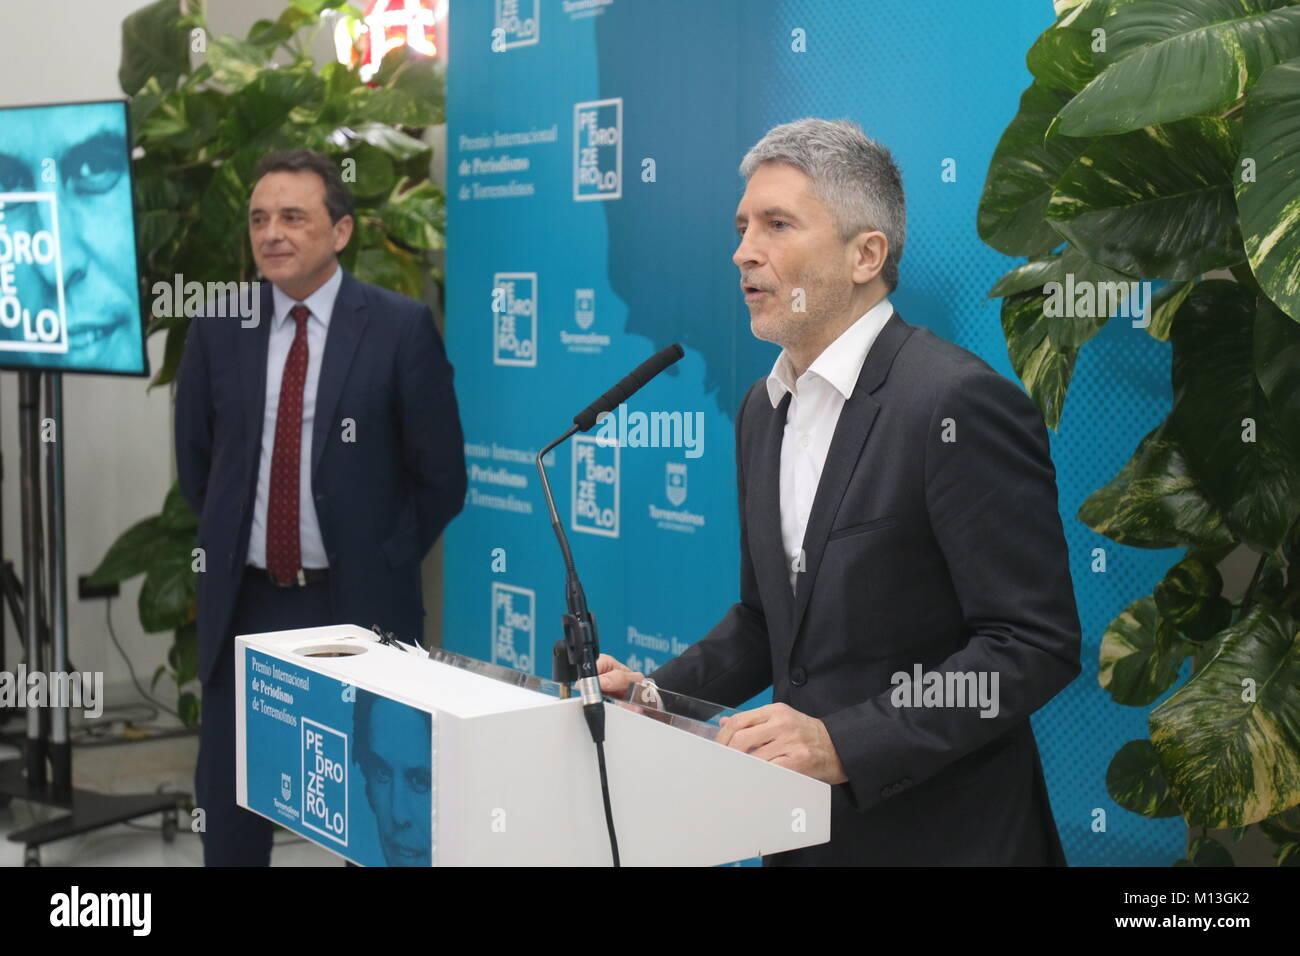 January 26, 2018 - Torremolinos (Malaga), January 26 Judge Grande-Marlaska receives in Torremolinos the prize of - Stock Image